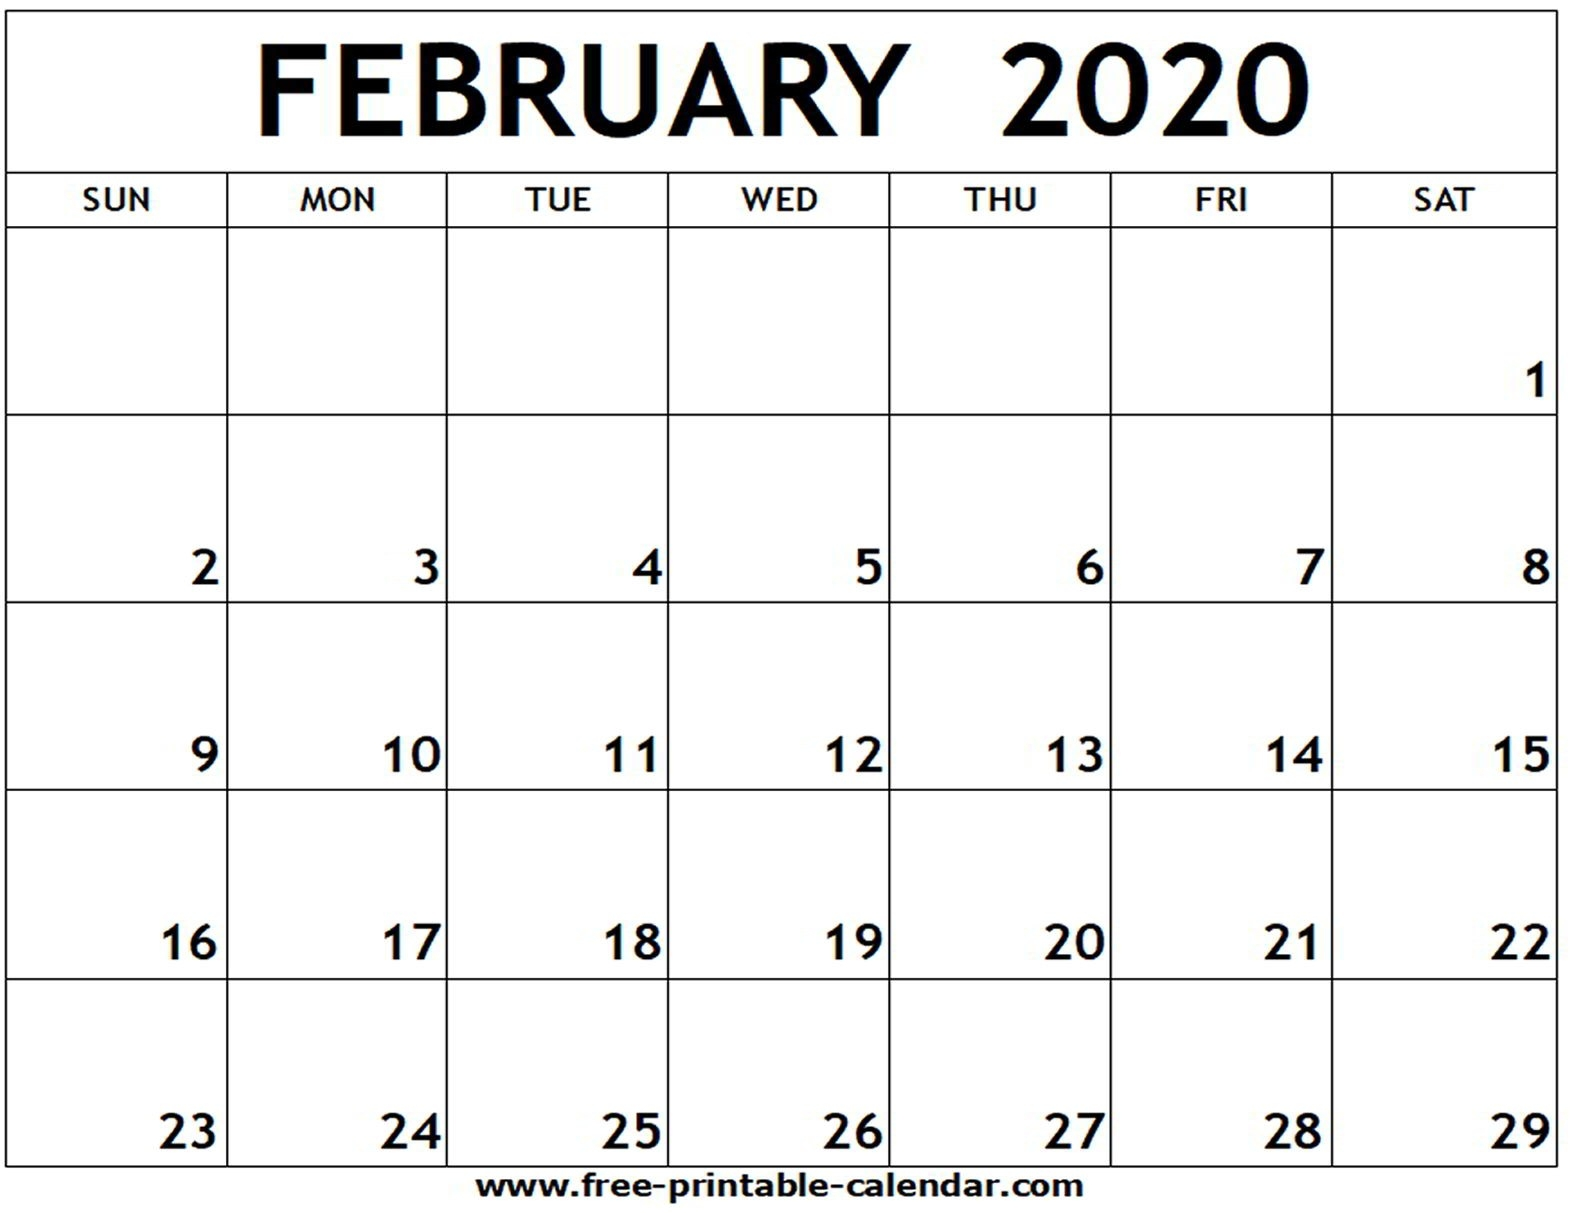 February 2020 Printable Calendar - Free-Printable-Calendar  Printable February 2020 Calendar Page